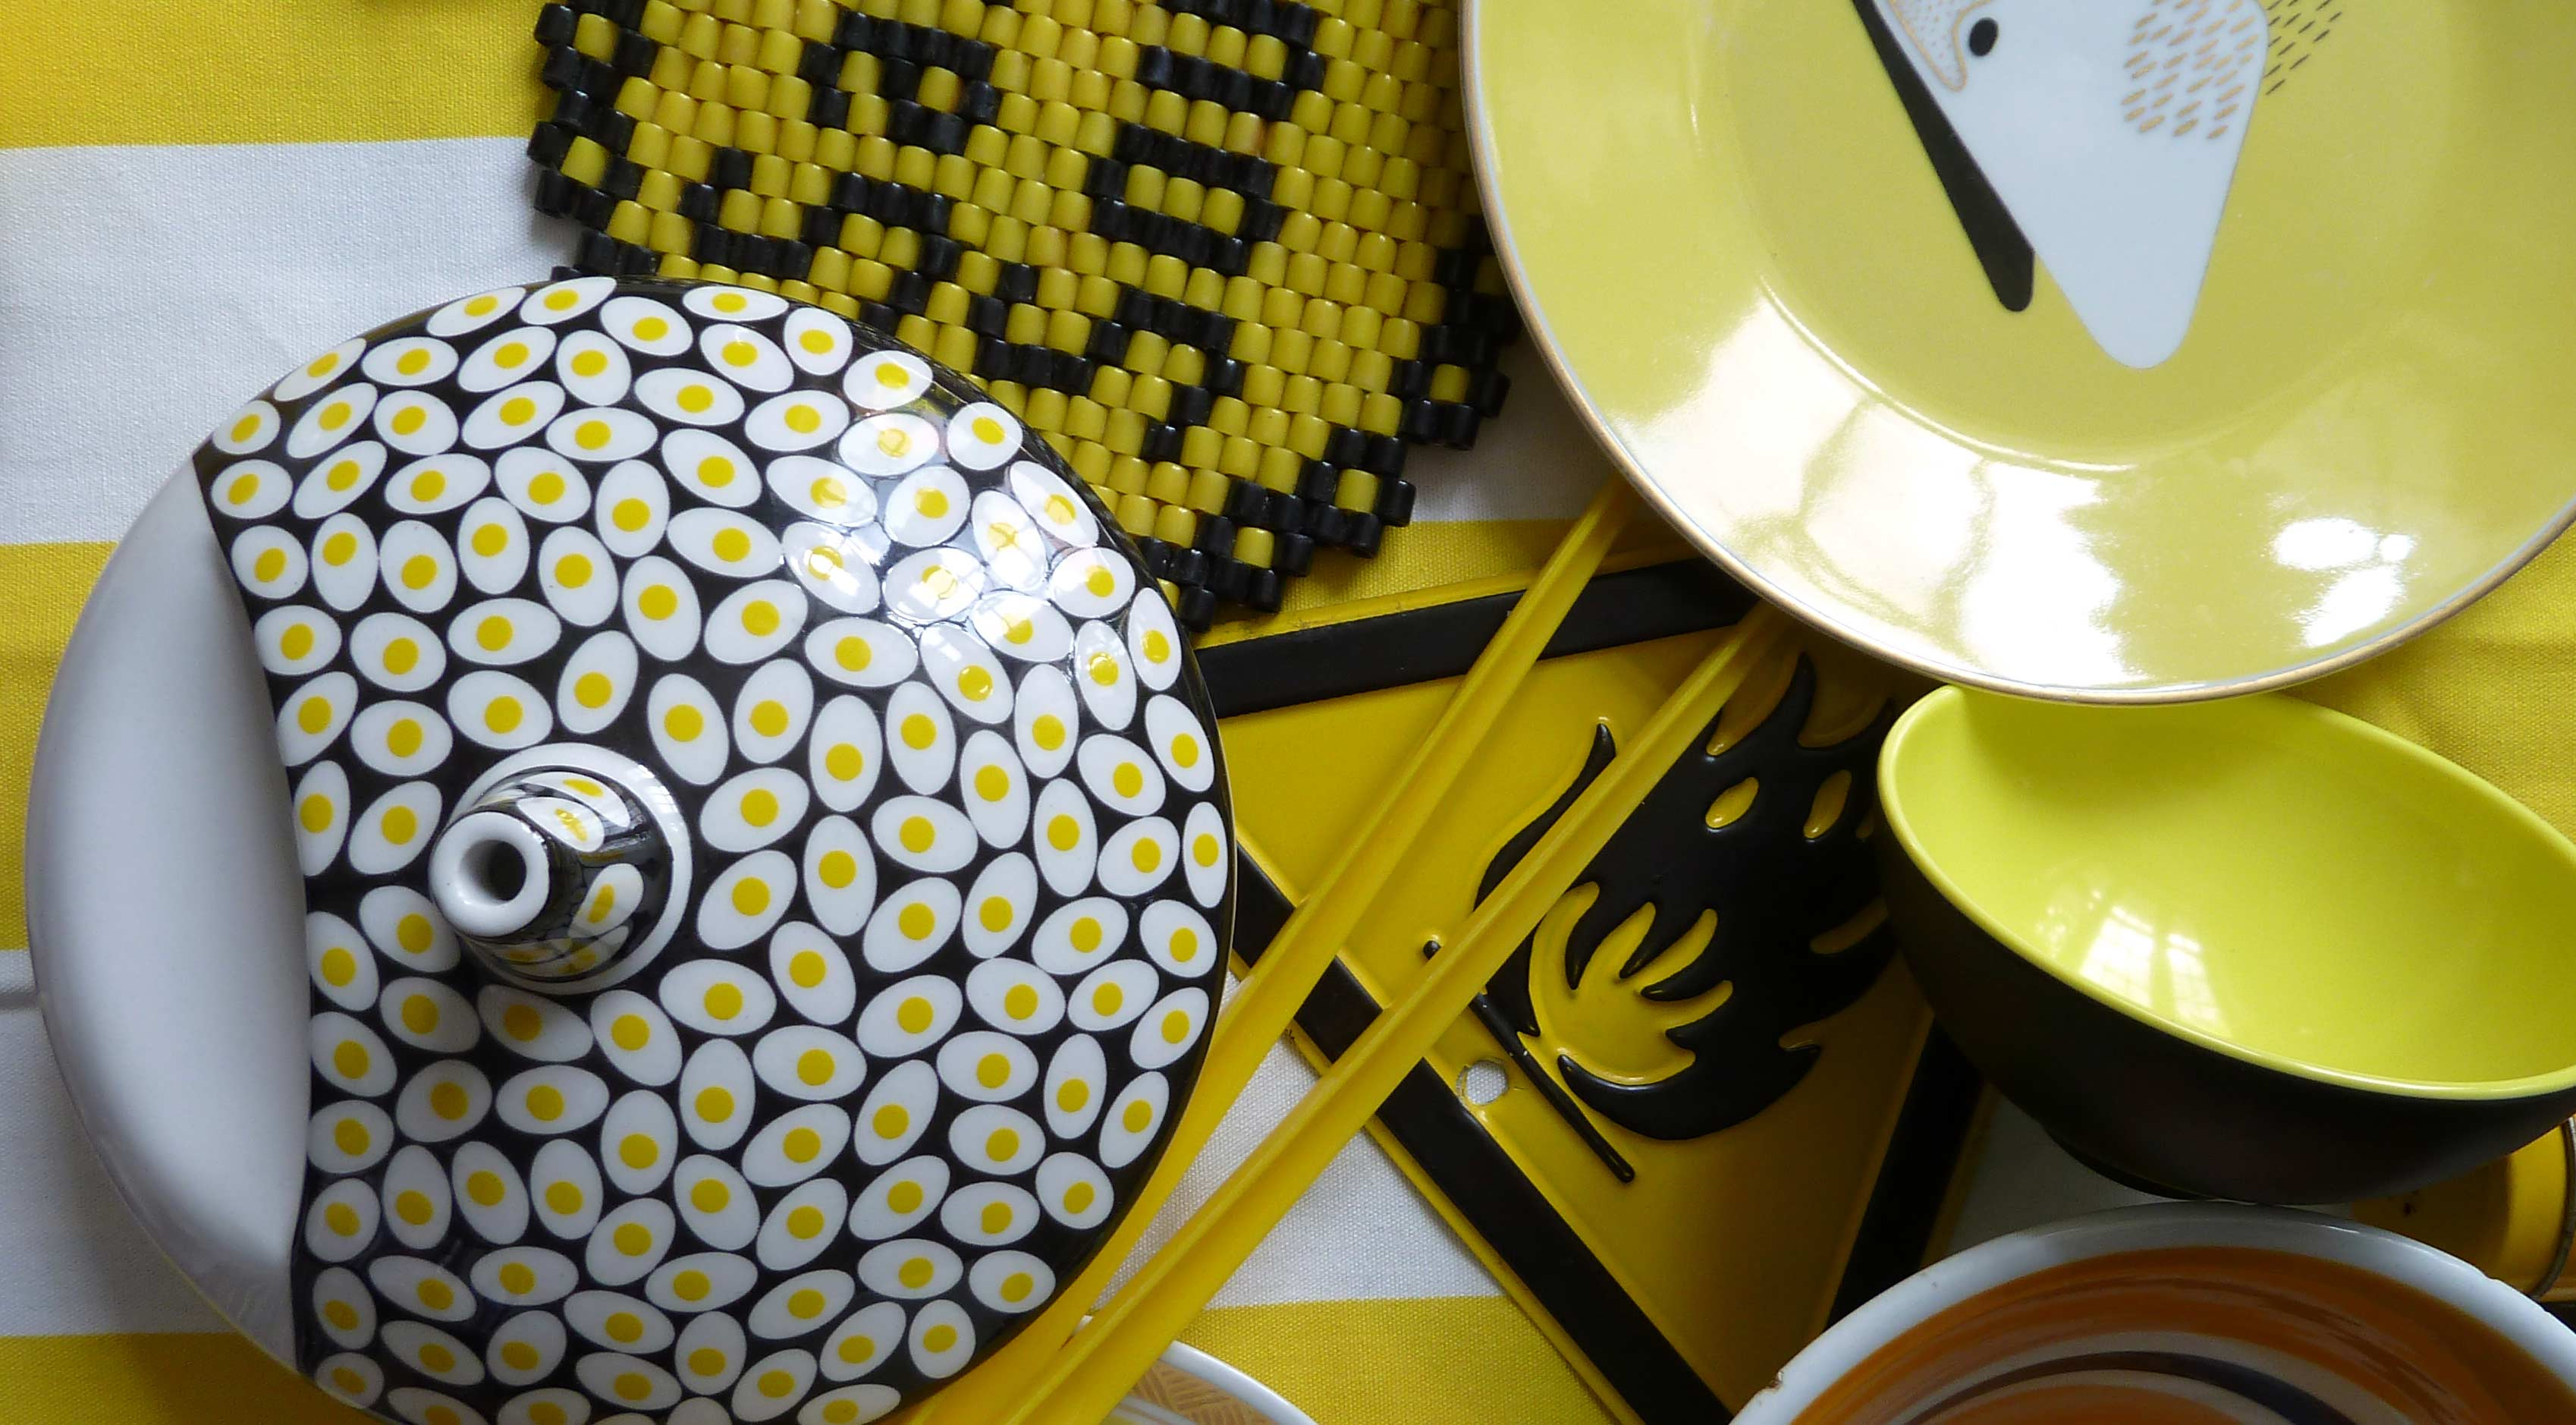 Porzellan Schalen Teller gelb